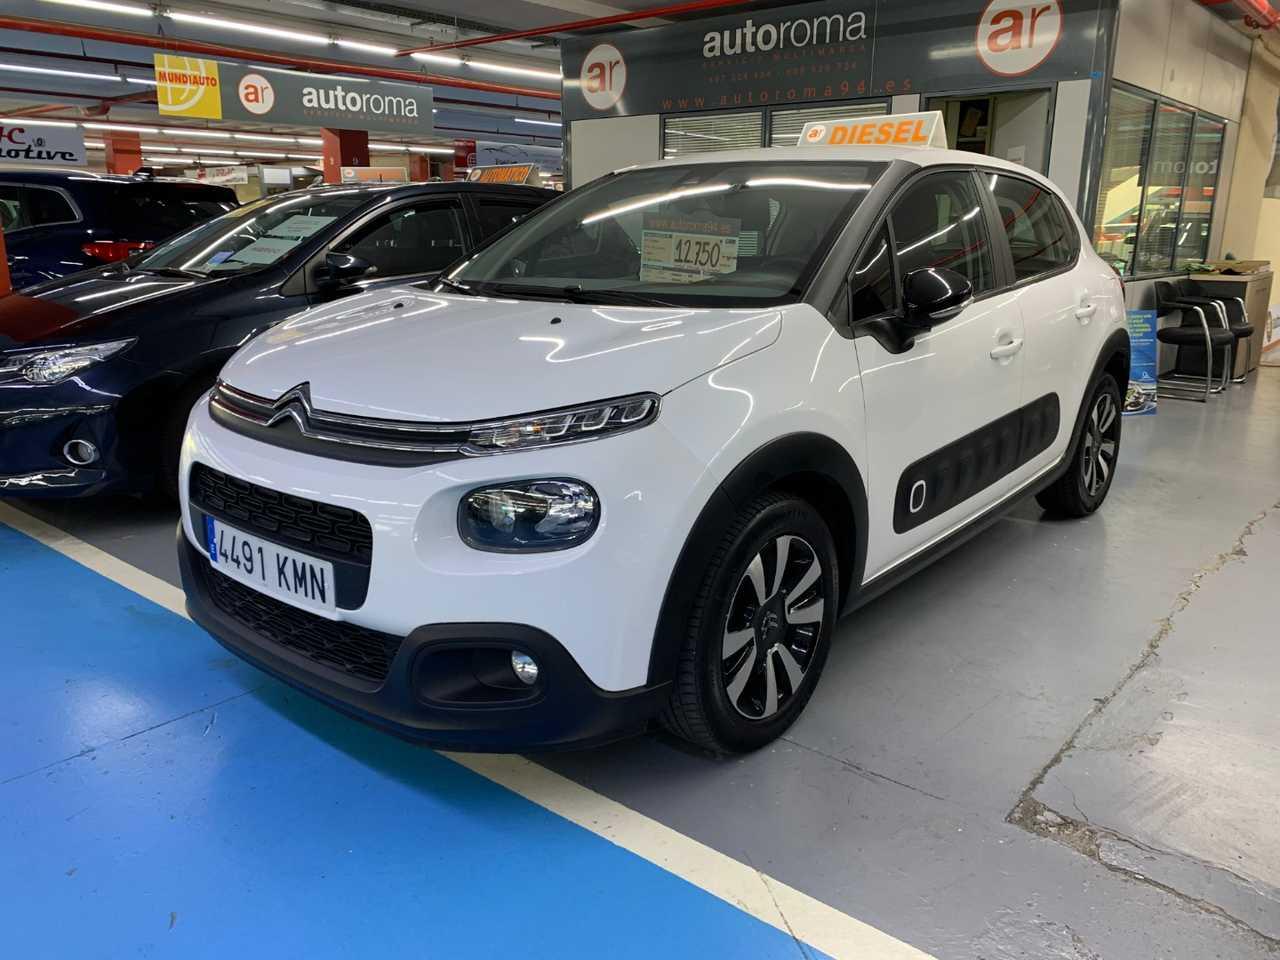 Citroën C3 HDI 100cv, PACK FEEL NAVEGADOR, AIR BUMP, ETC...   - Foto 1